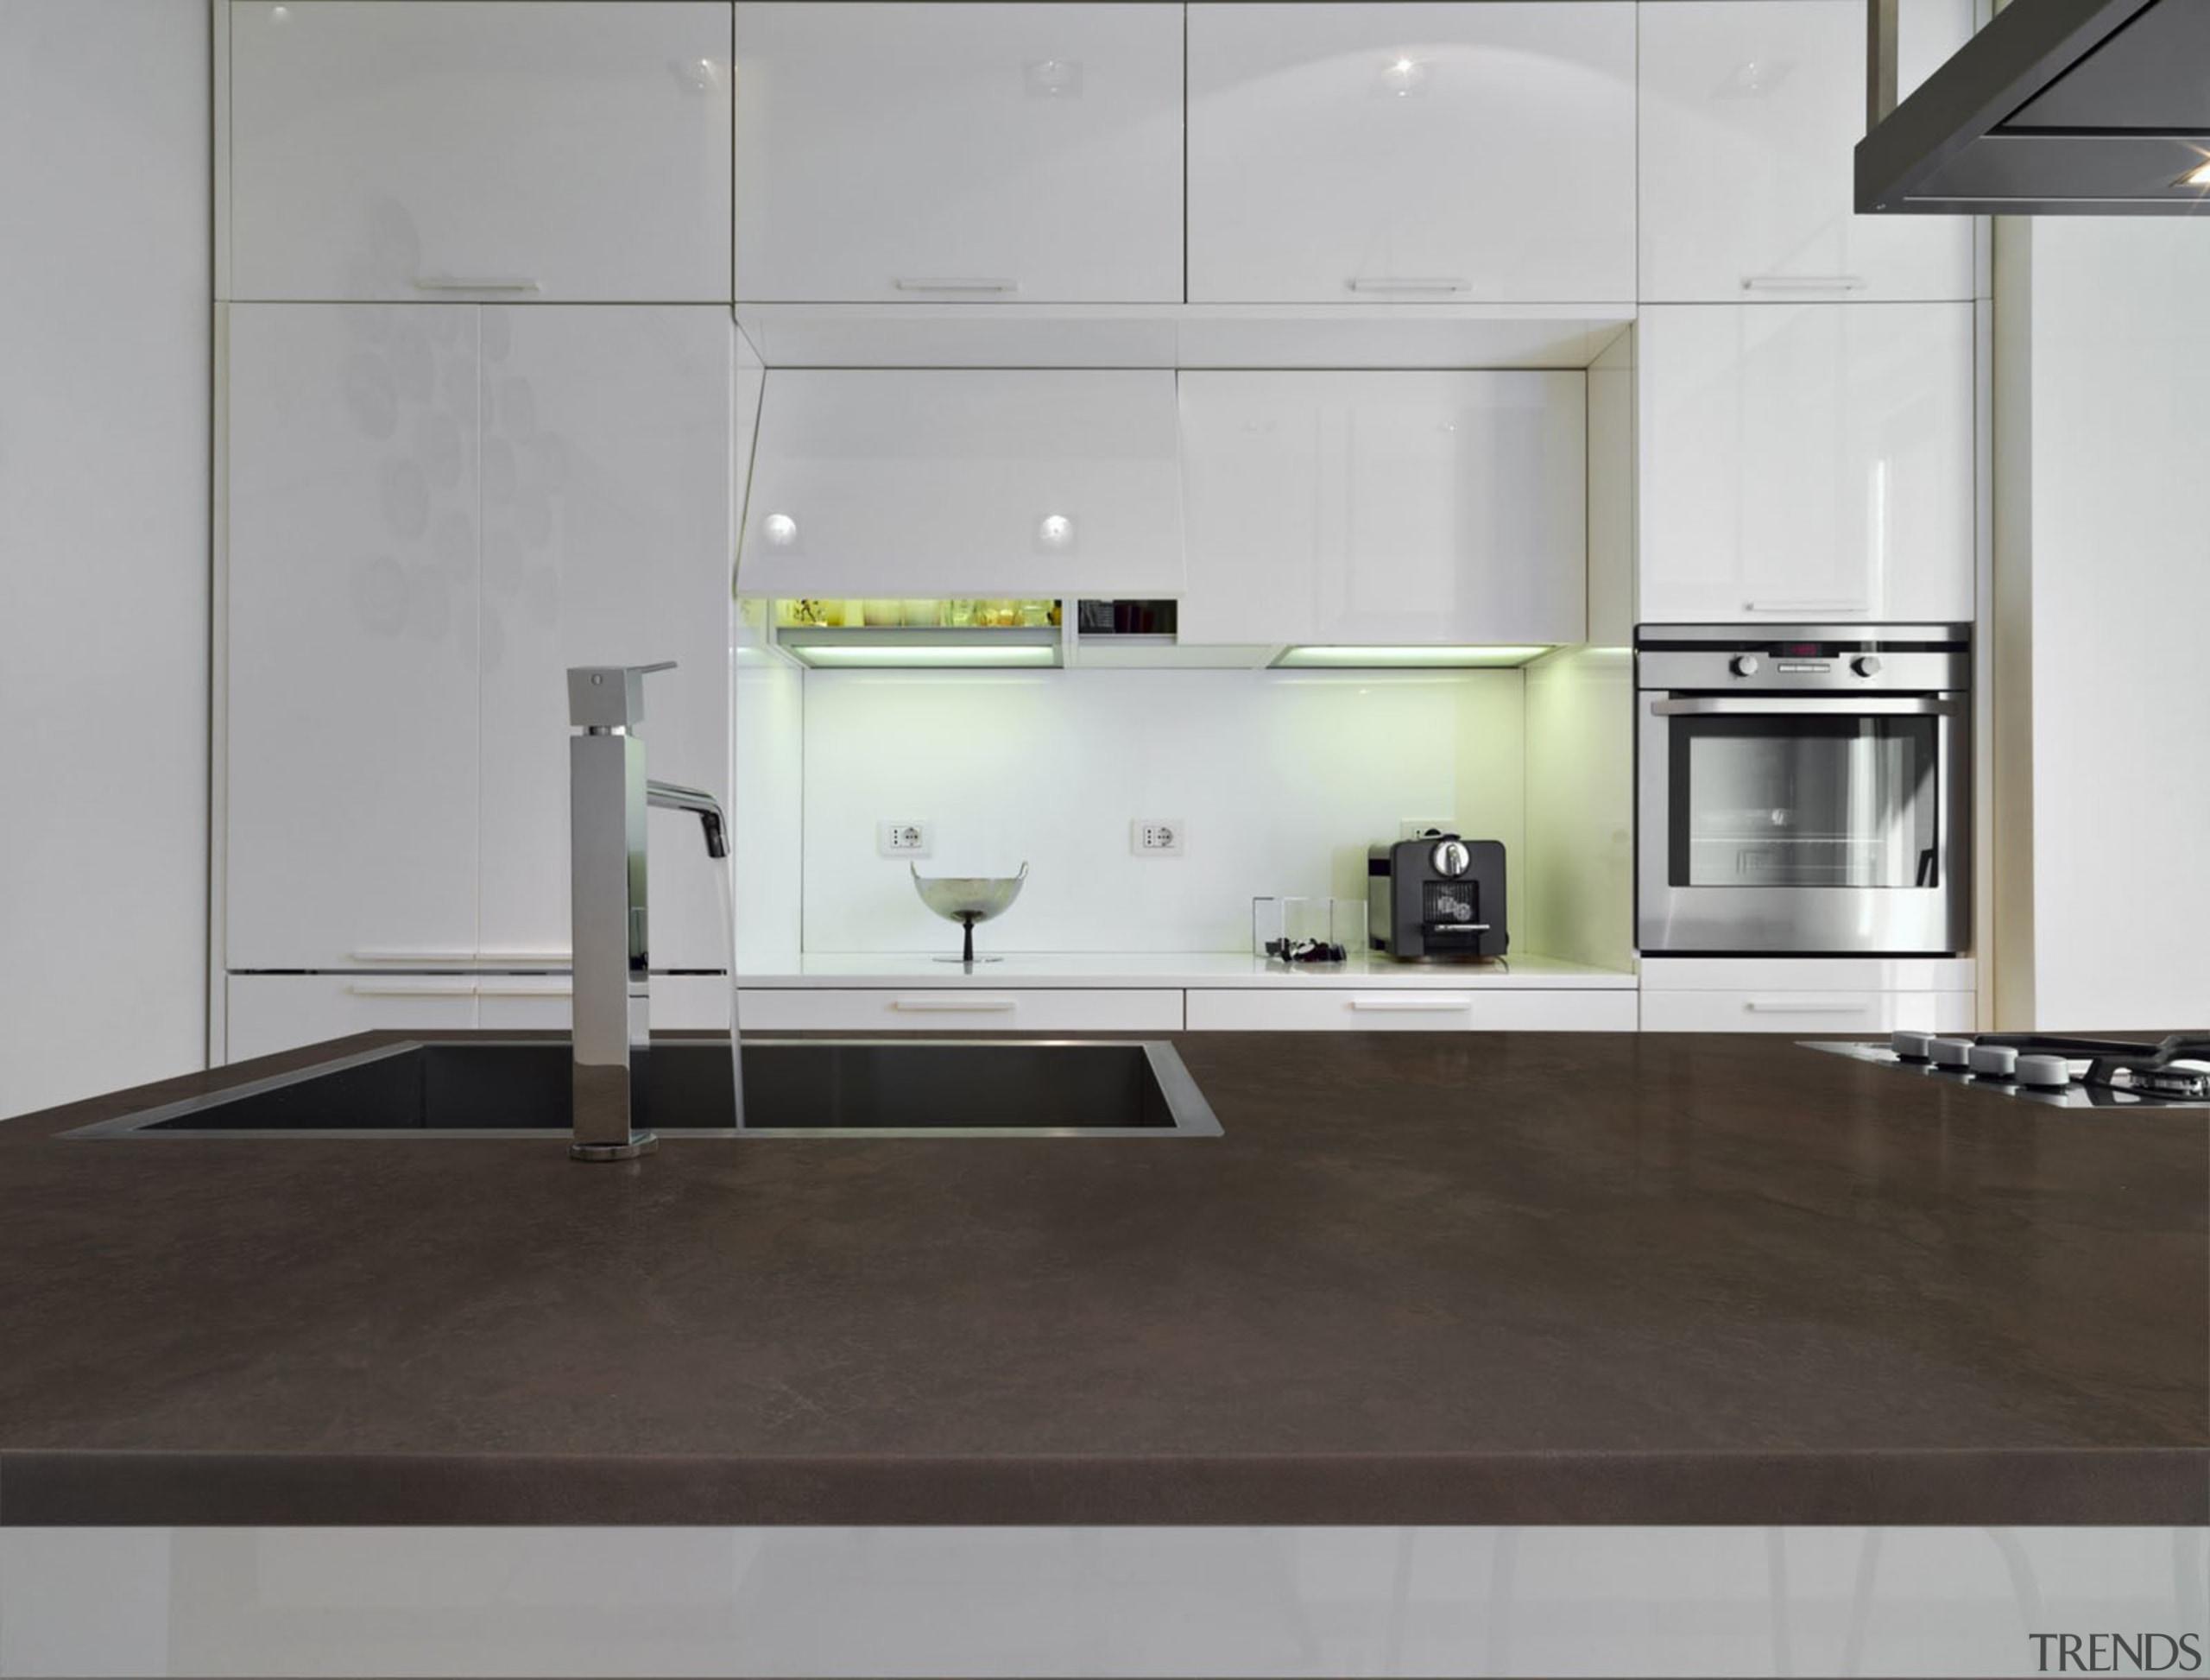 KERANIUM Encimera - KERANIUM Encimera - countertop | countertop, floor, home appliance, interior design, kitchen, product design, gray, black